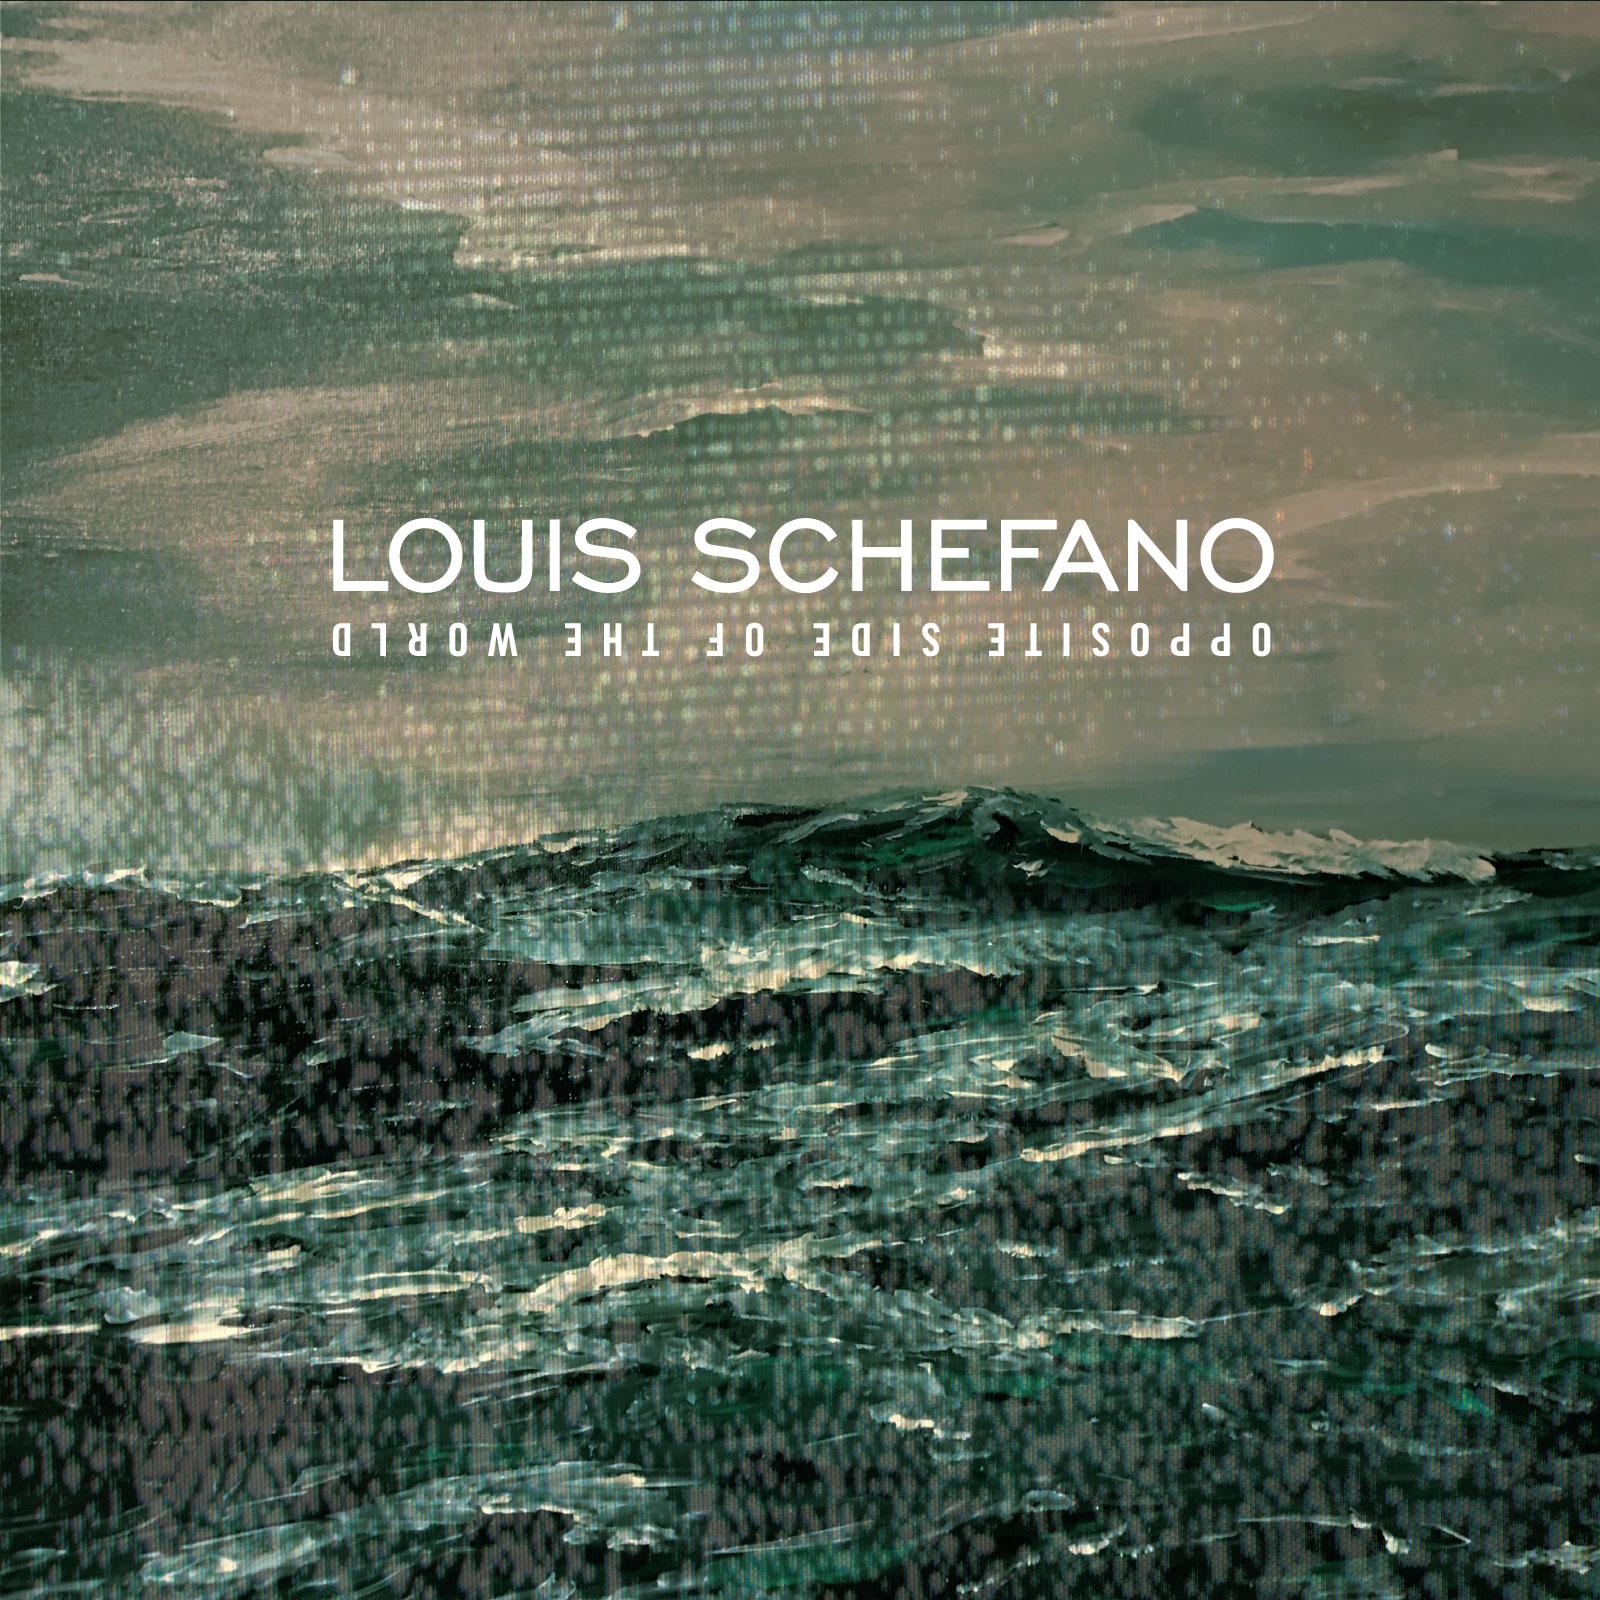 Louis-Schefano – Opposite Side of the World – ALBUM-ART –LOWRES.jpg